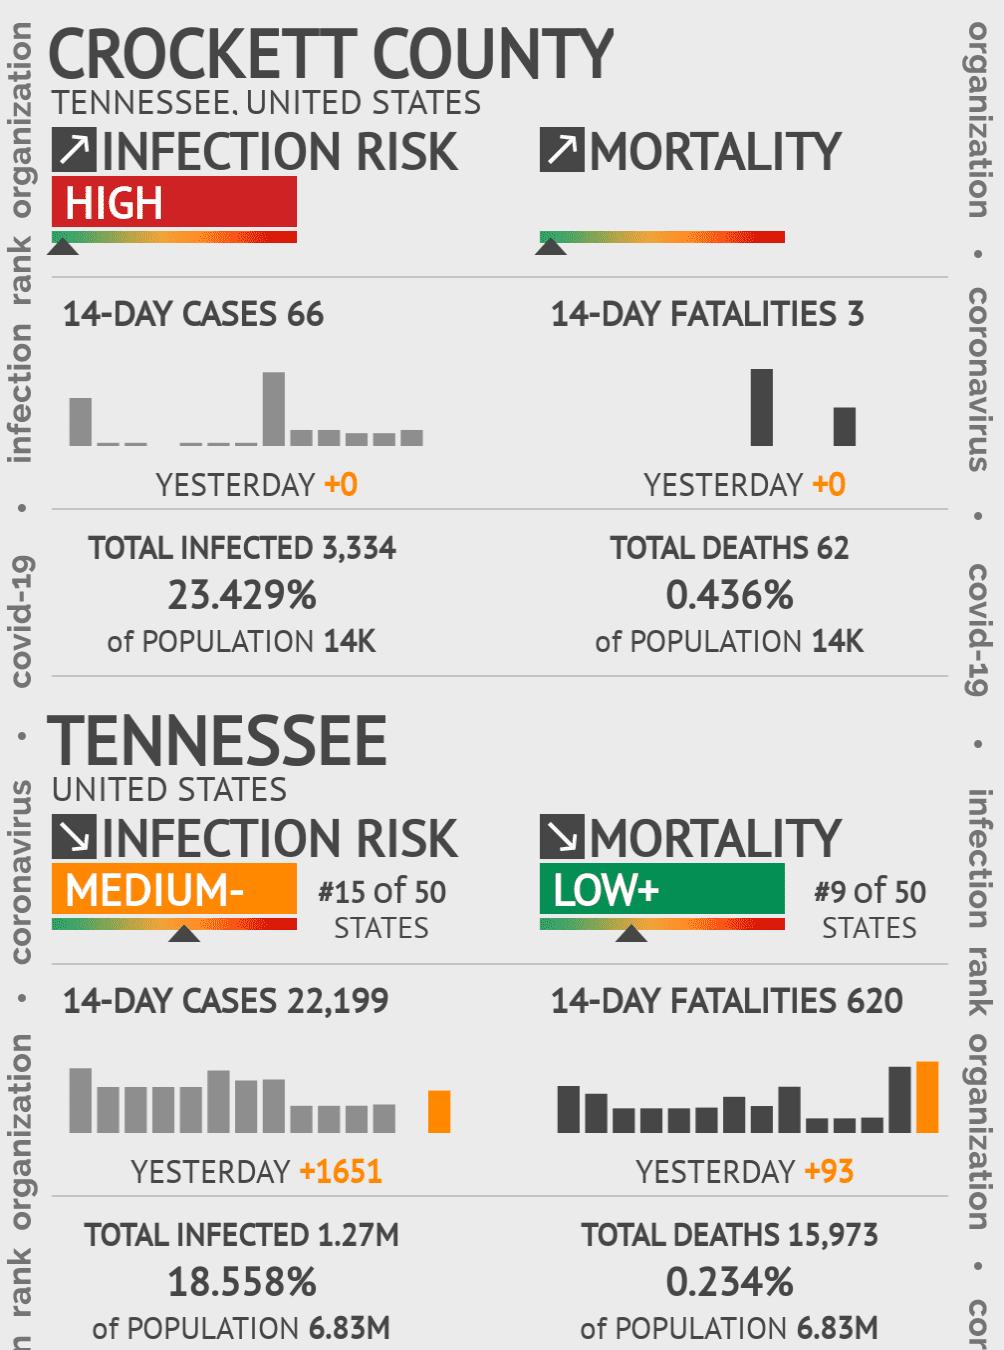 Crockett County Coronavirus Covid-19 Risk of Infection on February 28, 2021